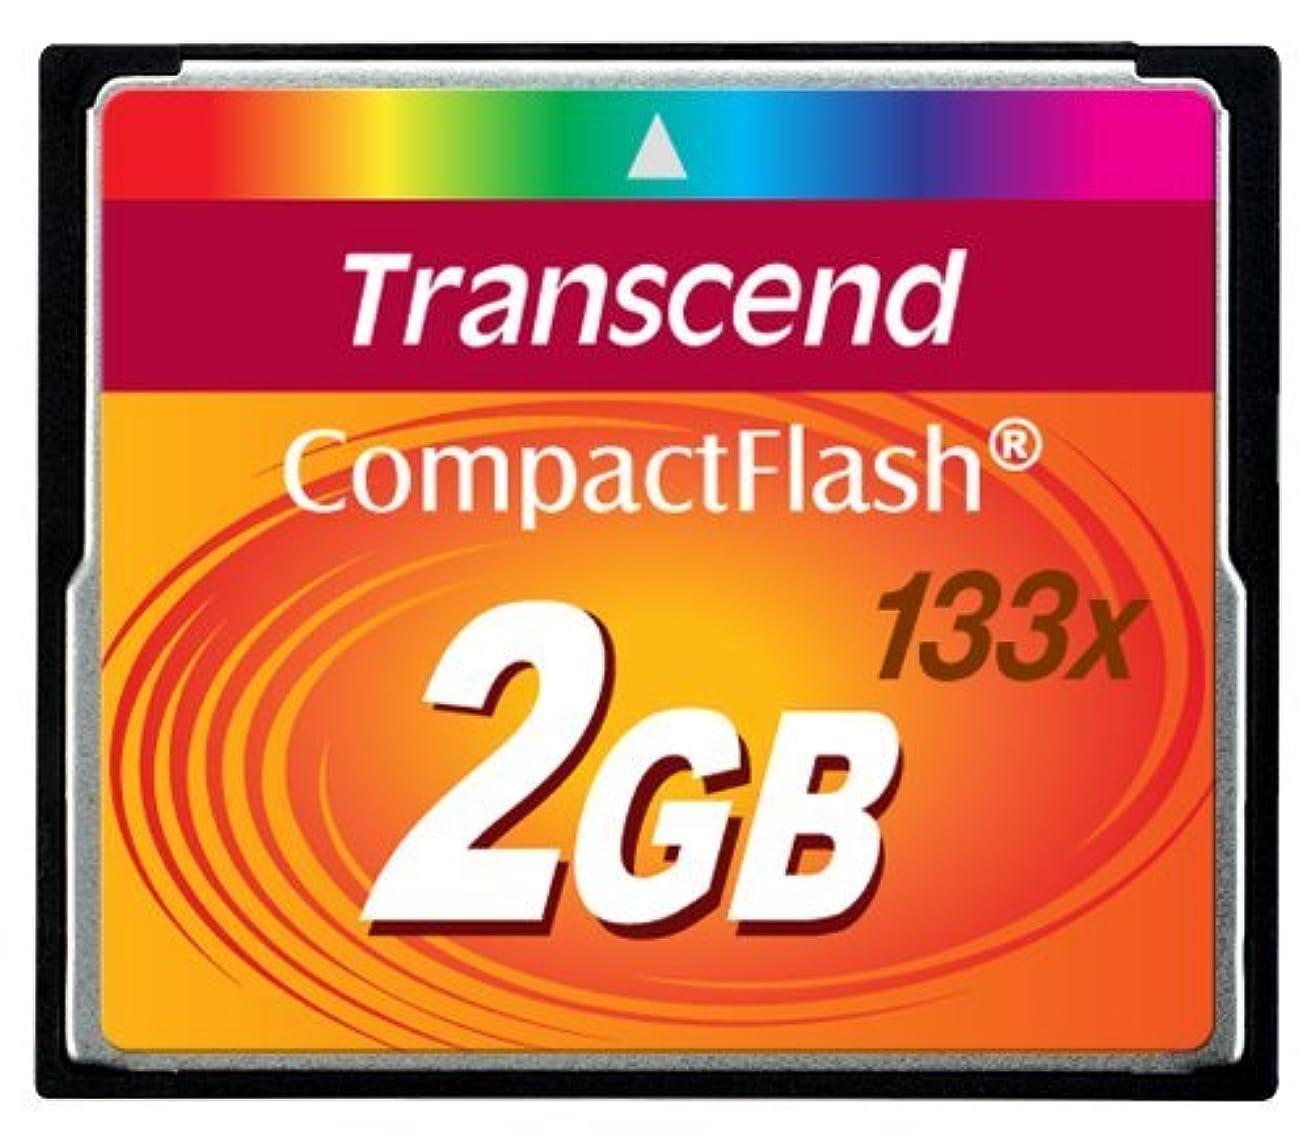 Portable, Transcend 2 GB 133x CompactFlash Memory Card TS2GCF133 Size: 2 GB Consumer Electronic Gadget Shop